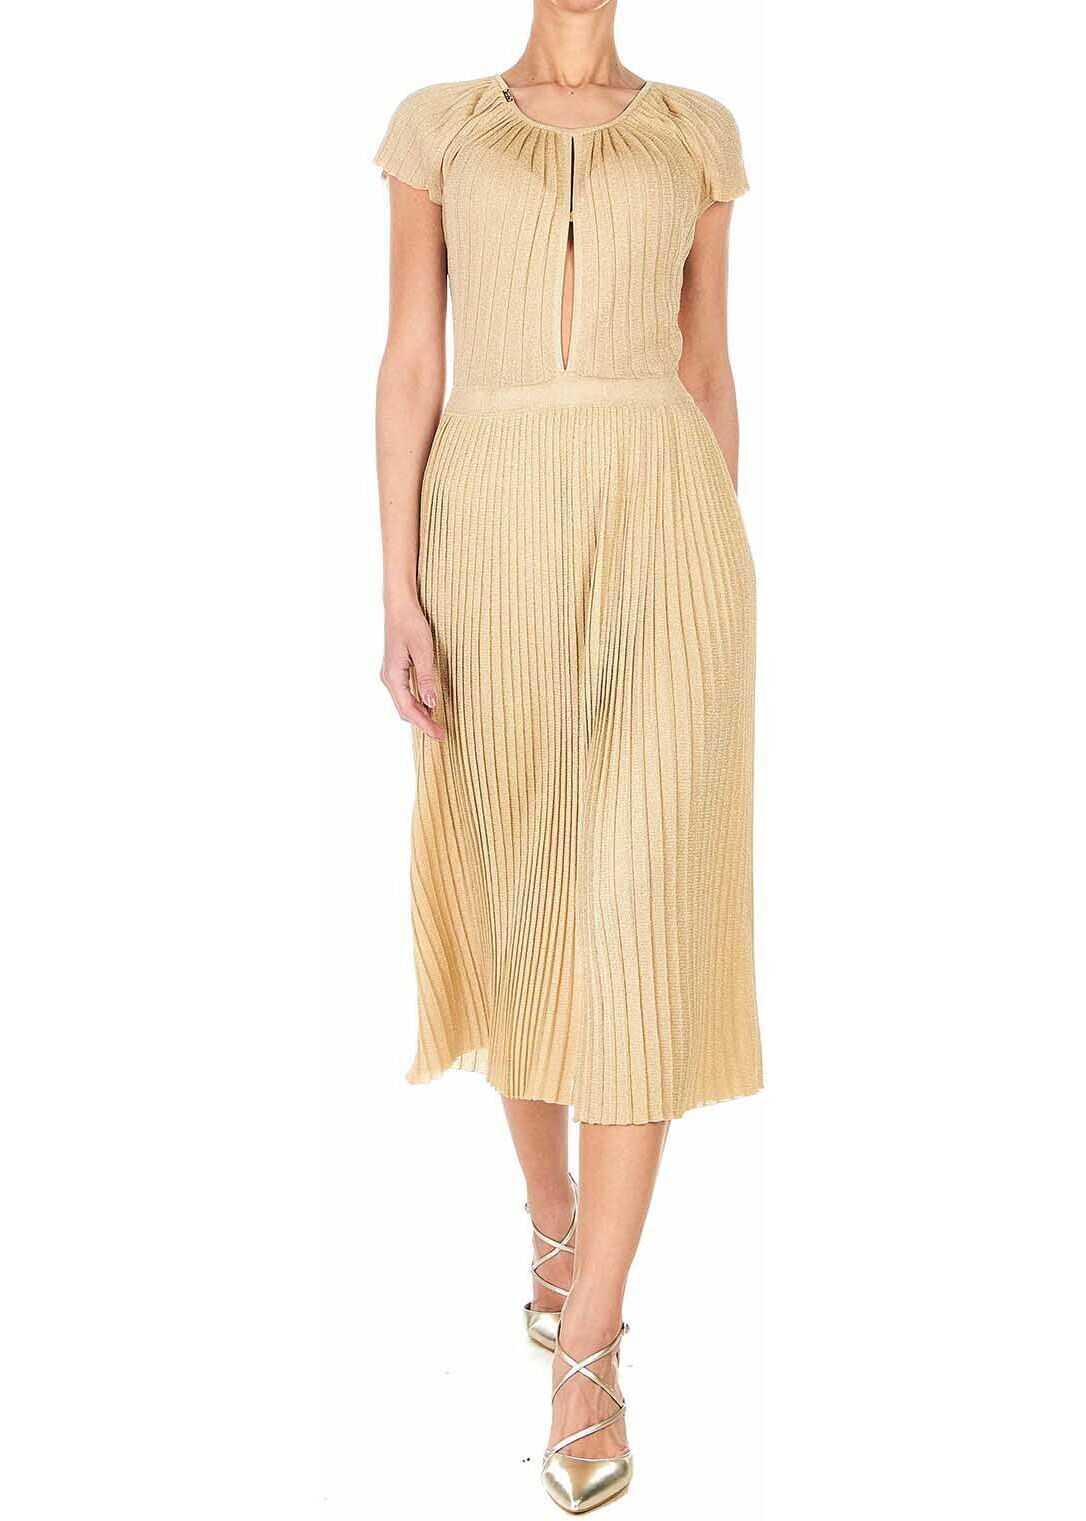 Elisabetta Franchi Dress with accordion pleats Gold